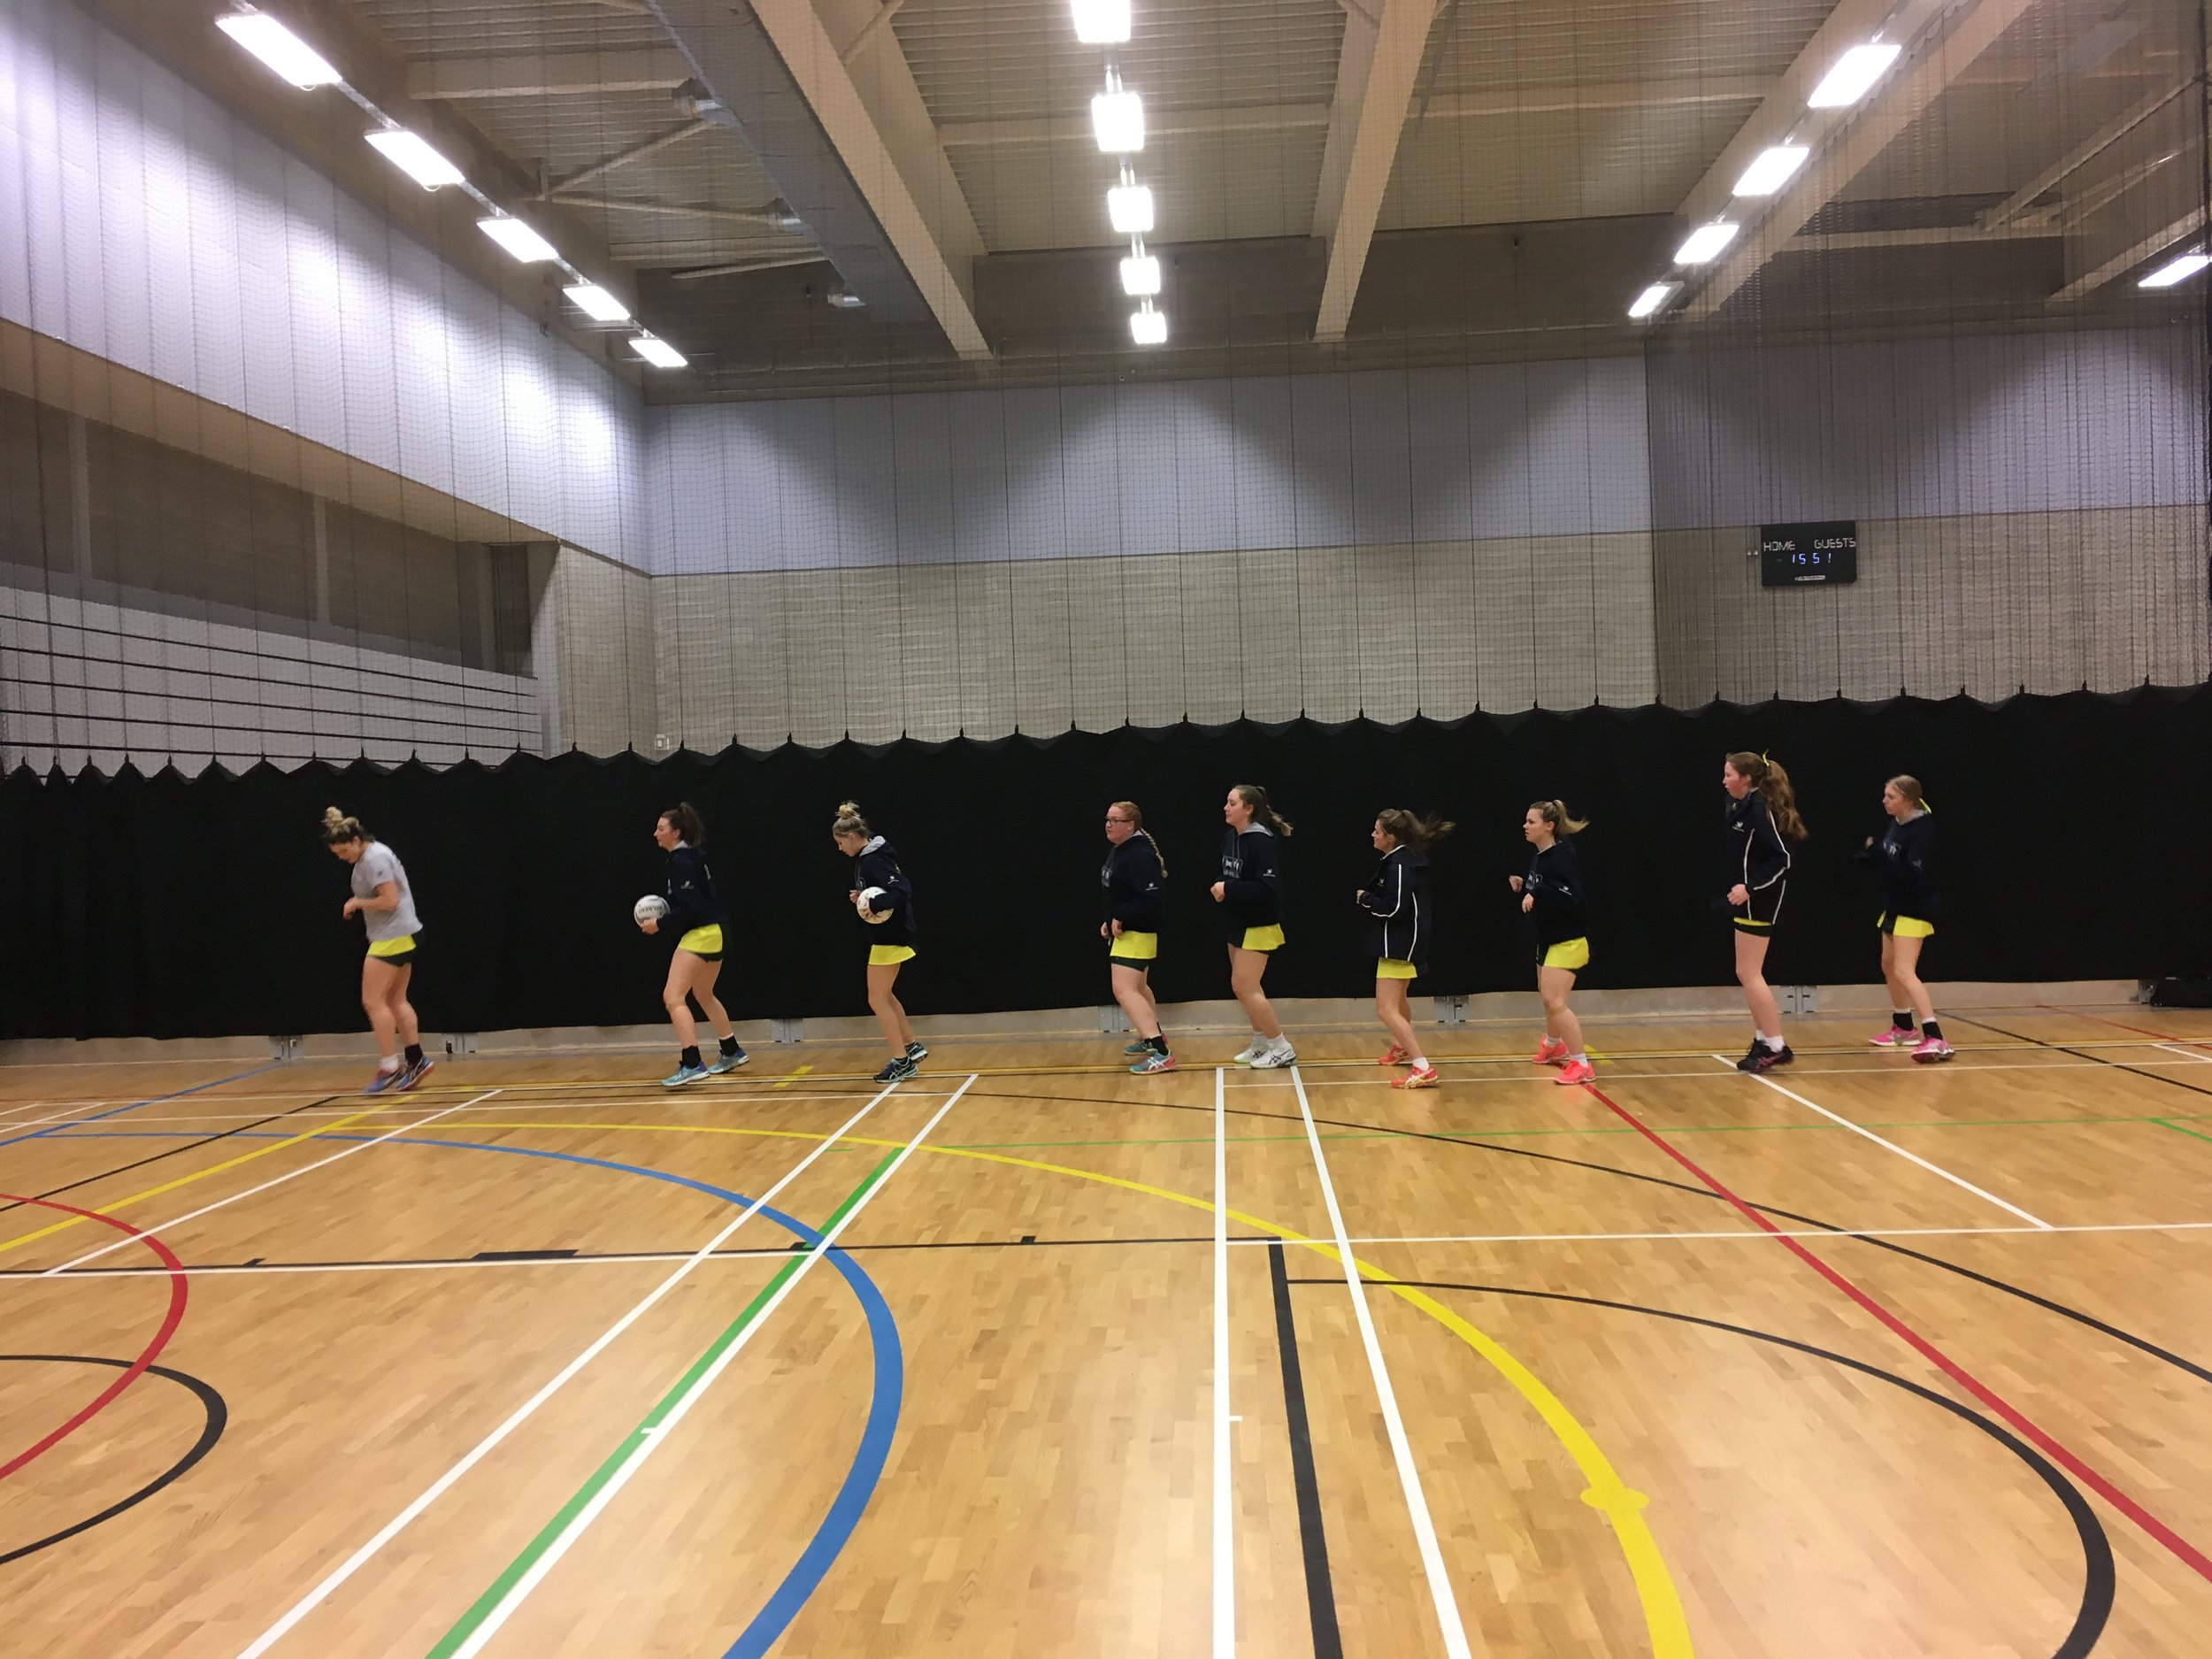 18&U girls warming up for their match